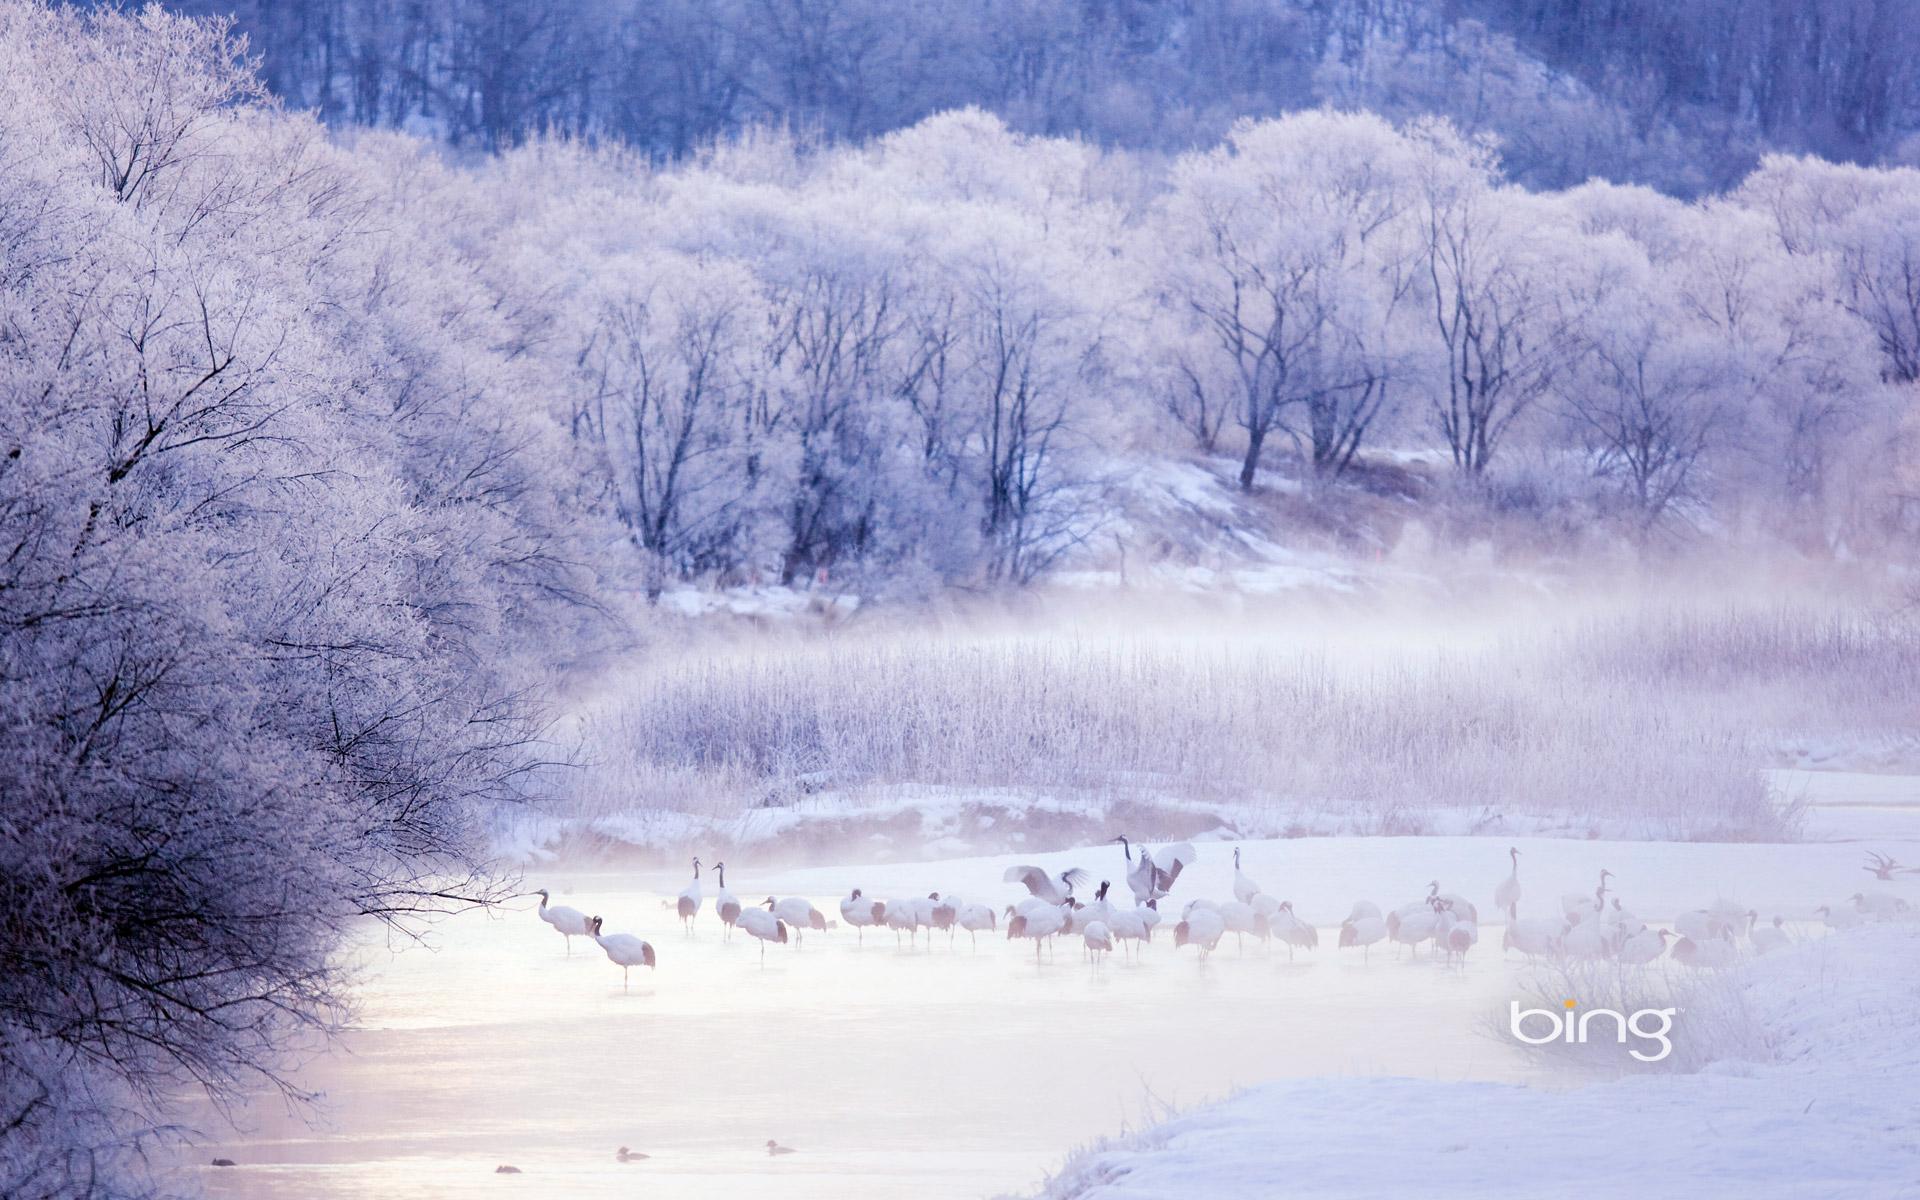 Red-crowned cranes in Kushiro-Shitsugen National Park, Hokkaido, Japan